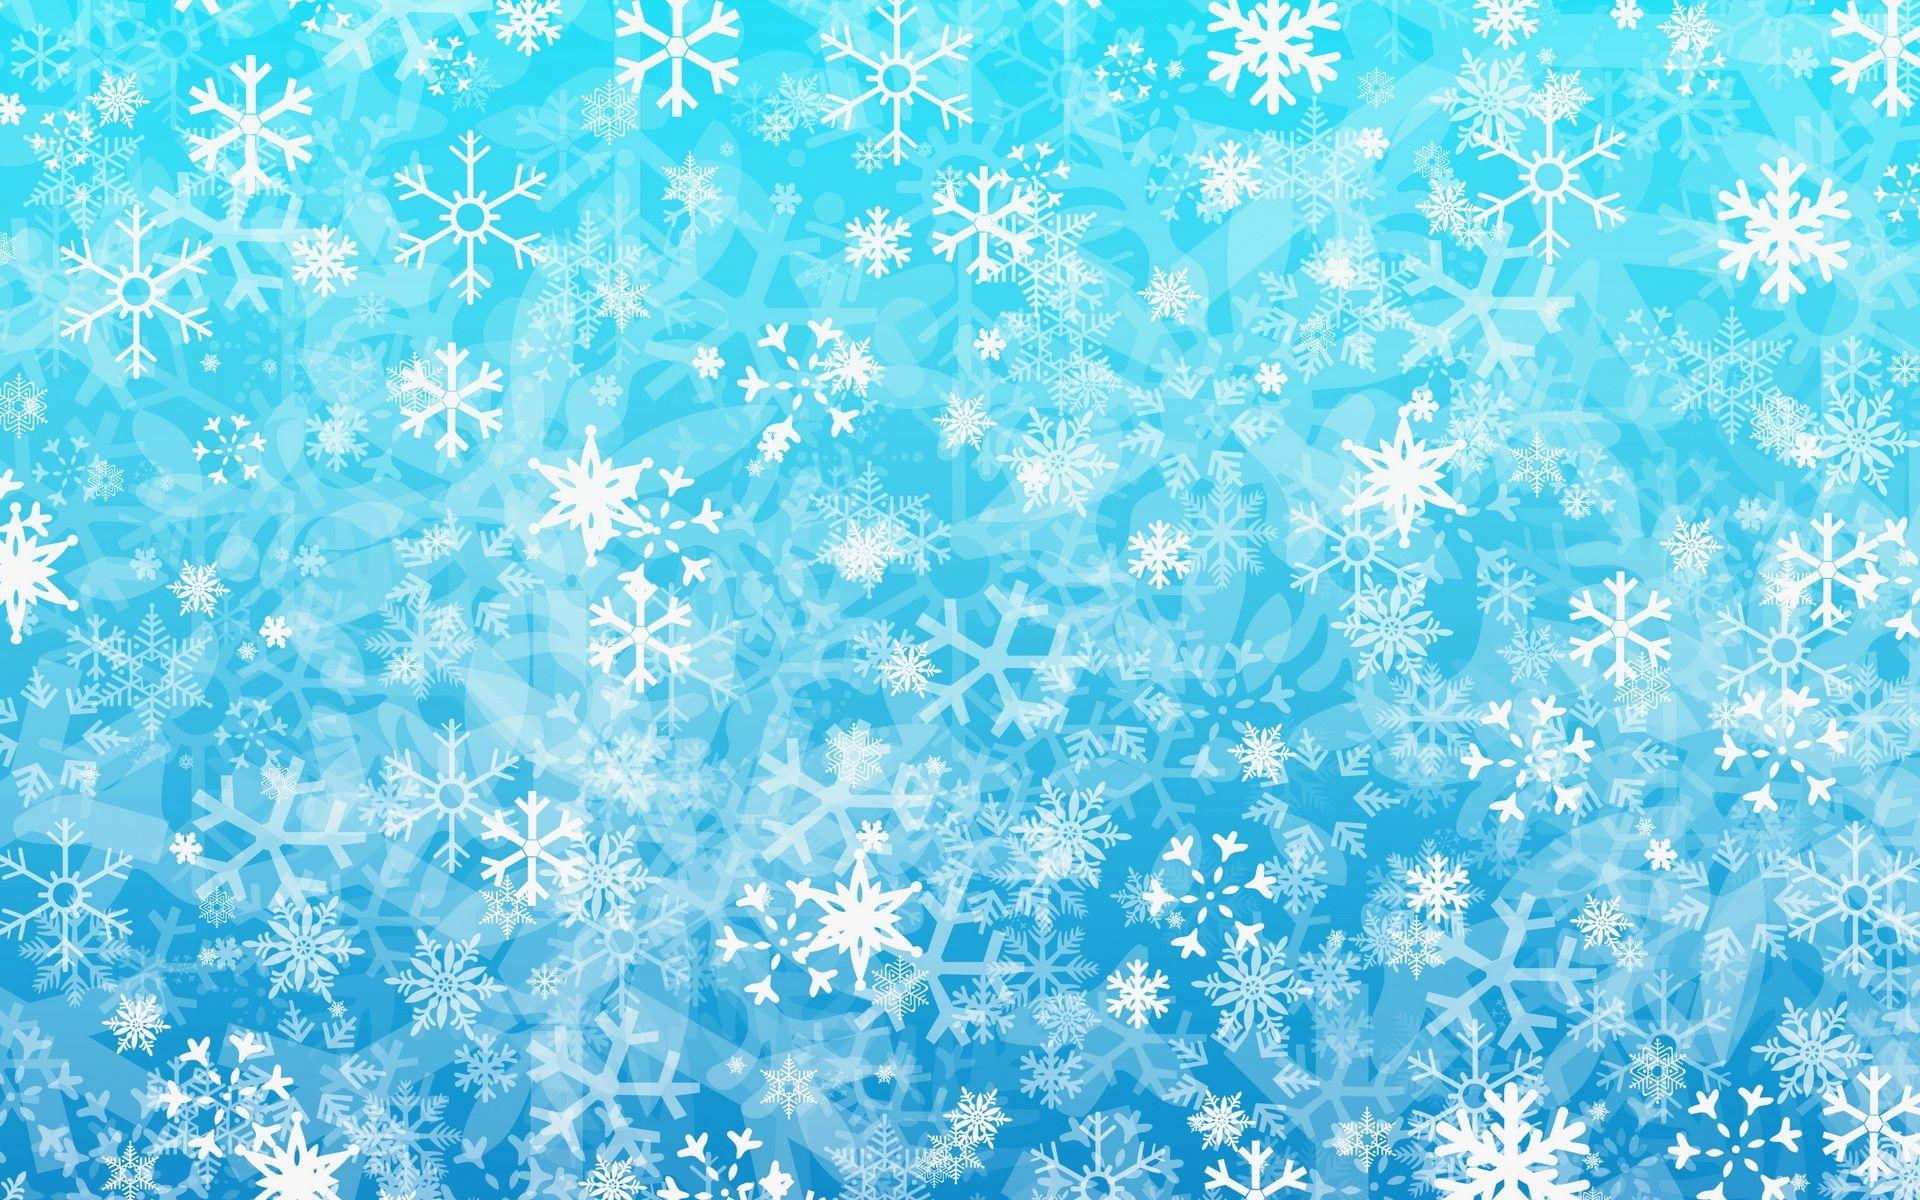 White Snowflake Wallpaper High Resolution 80j0b aHuHaH